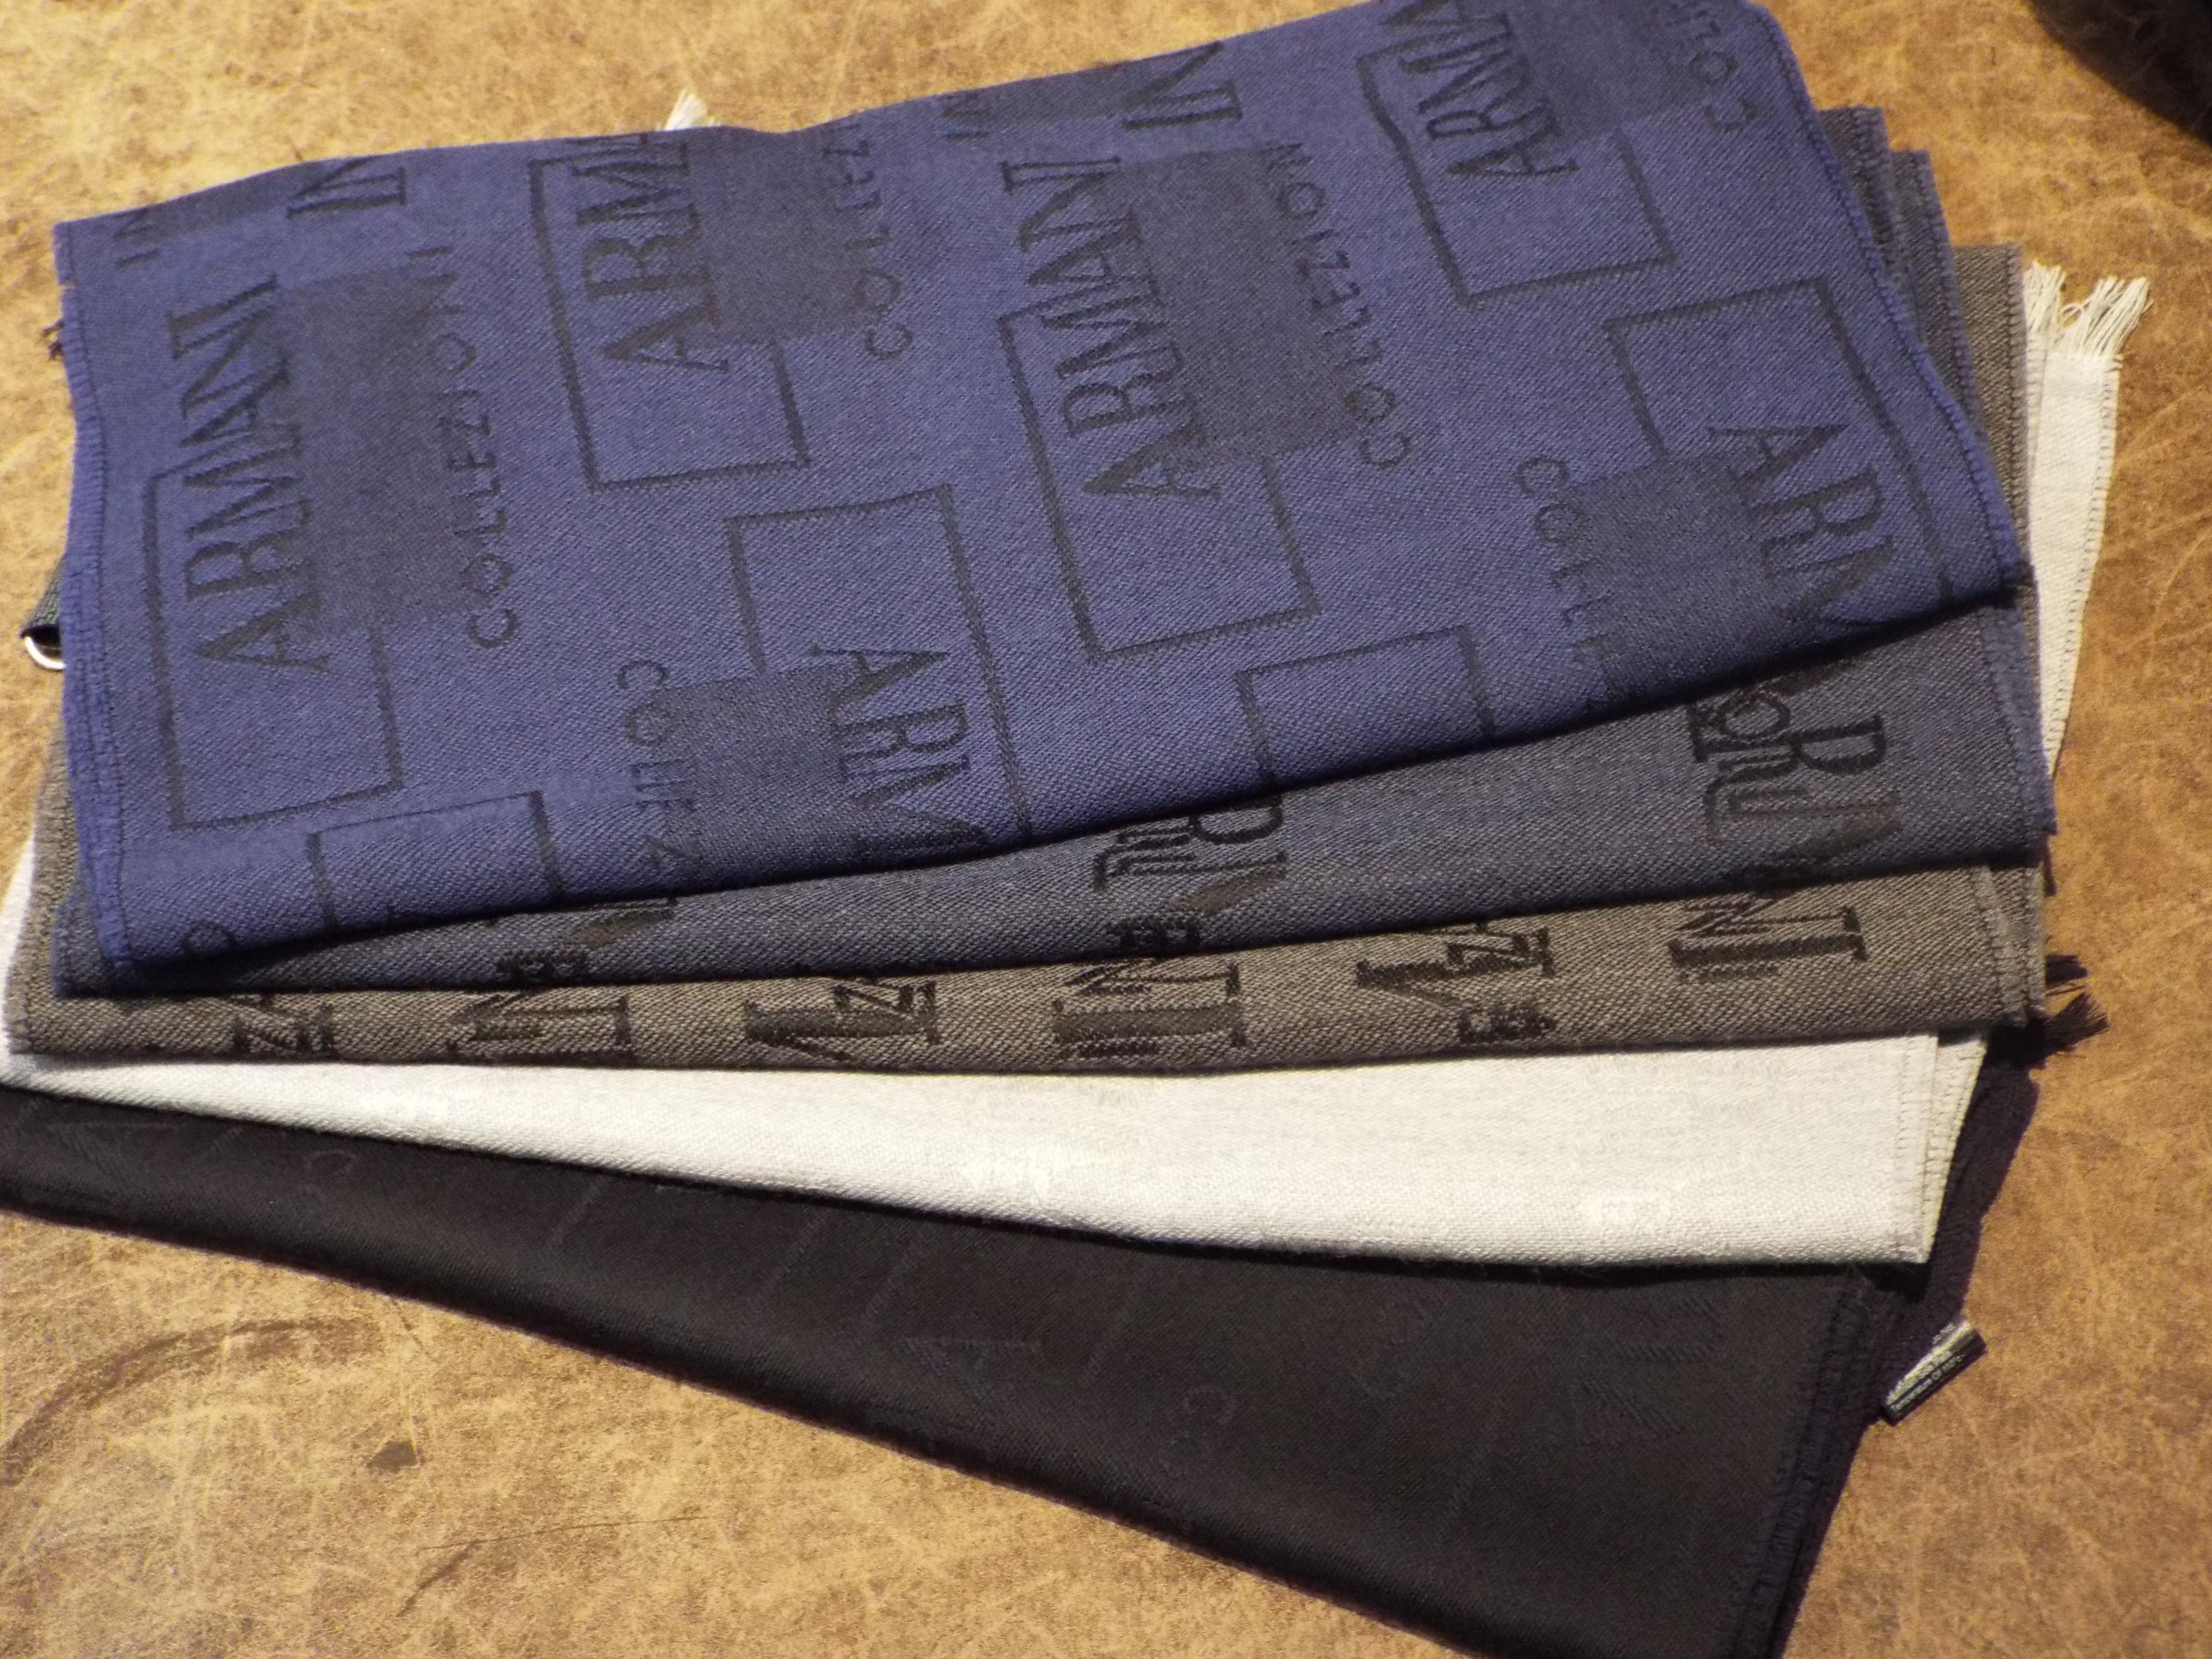 esigner menswear christmas gifts for men armani scarves